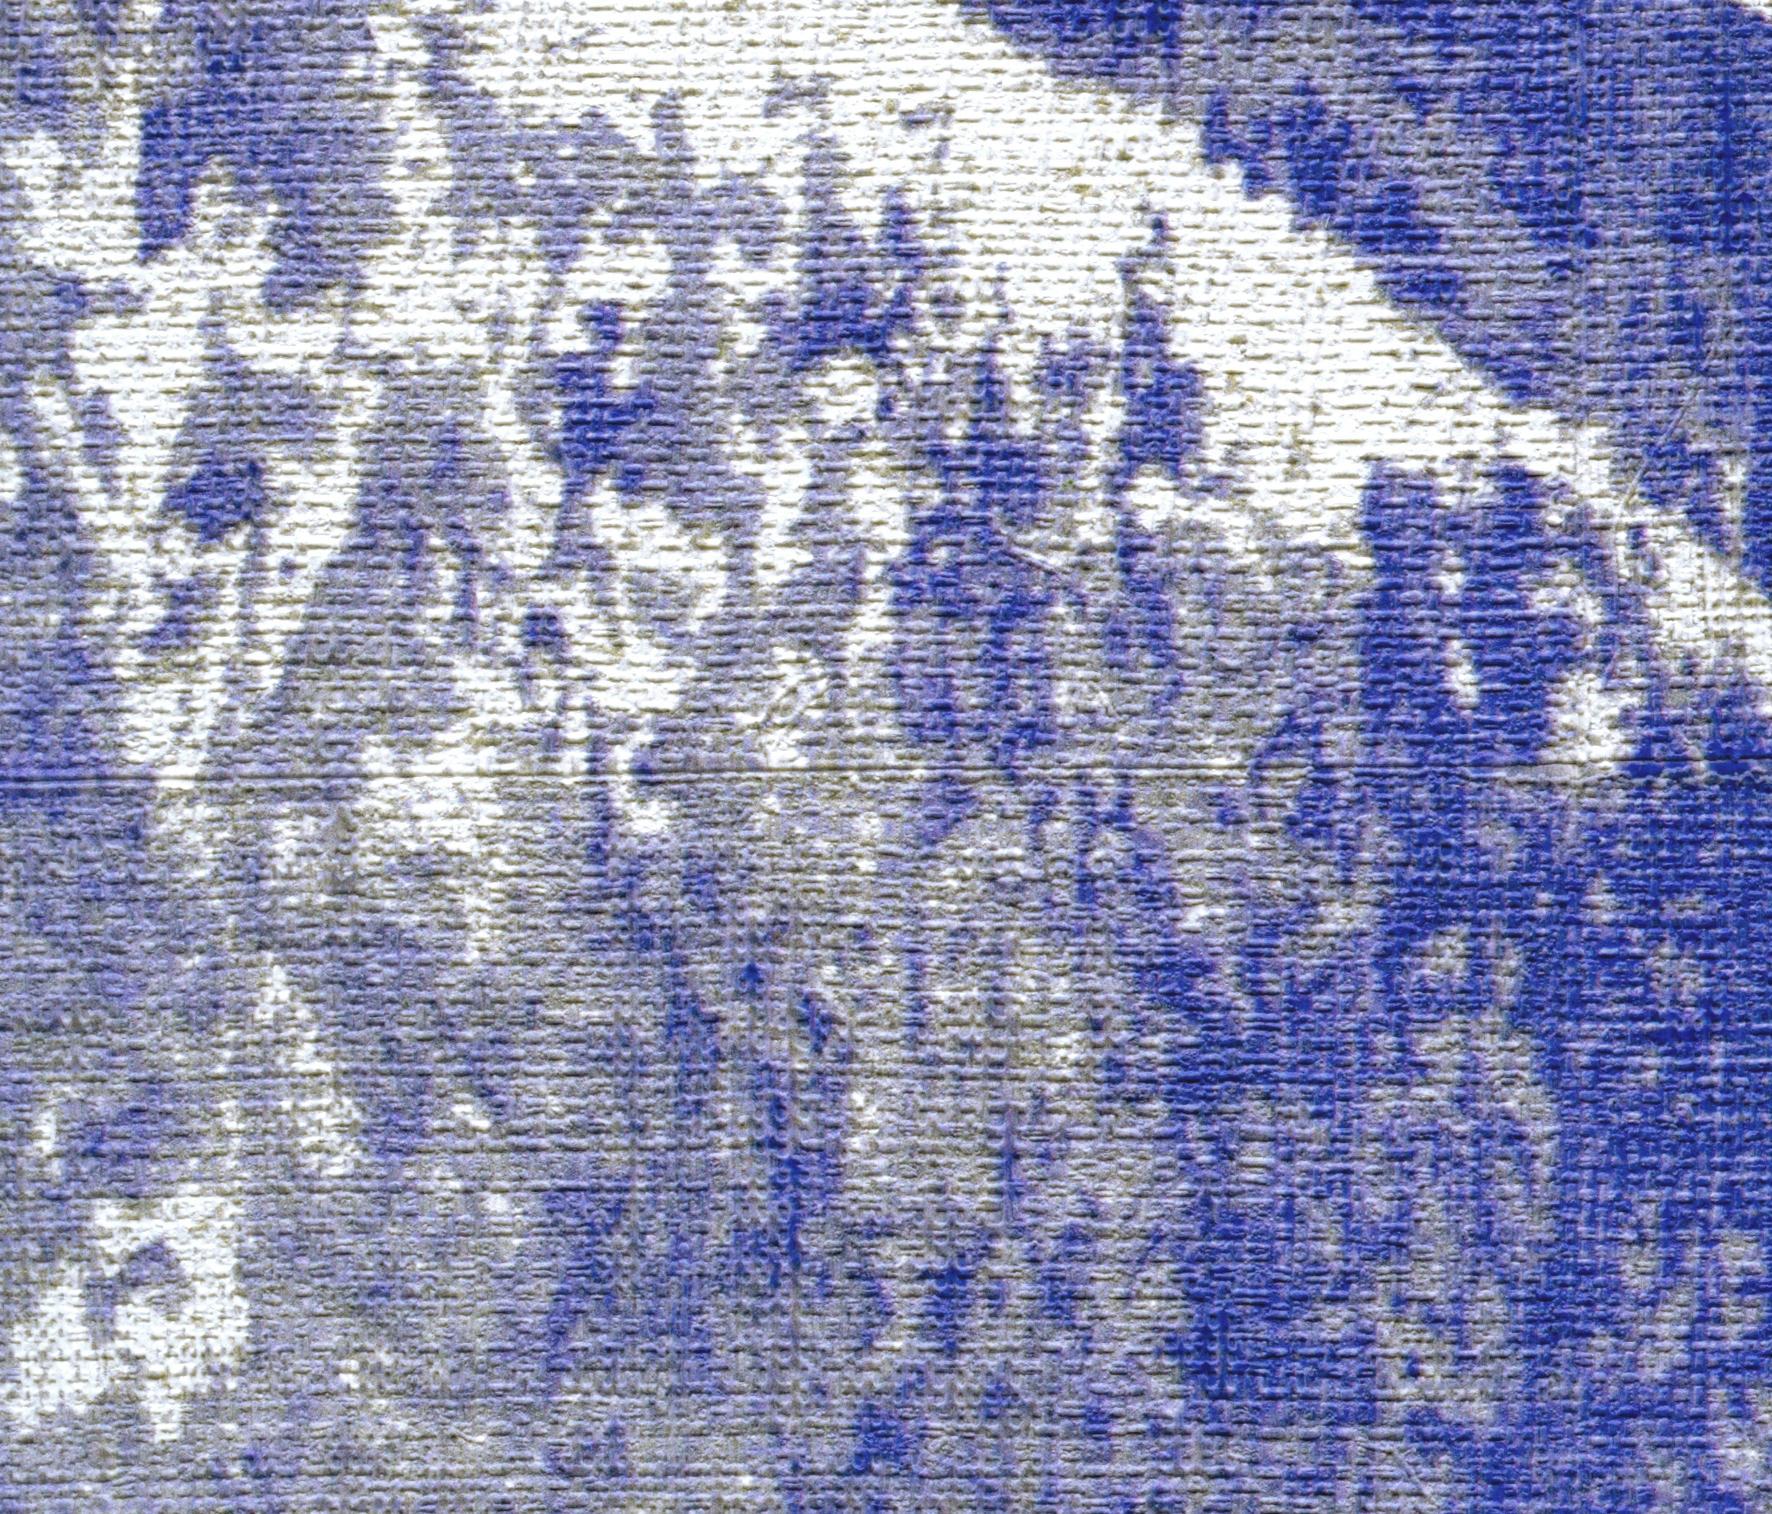 Eldorado Santorin Vp 881 01 Revetements Muraux Papiers Peint